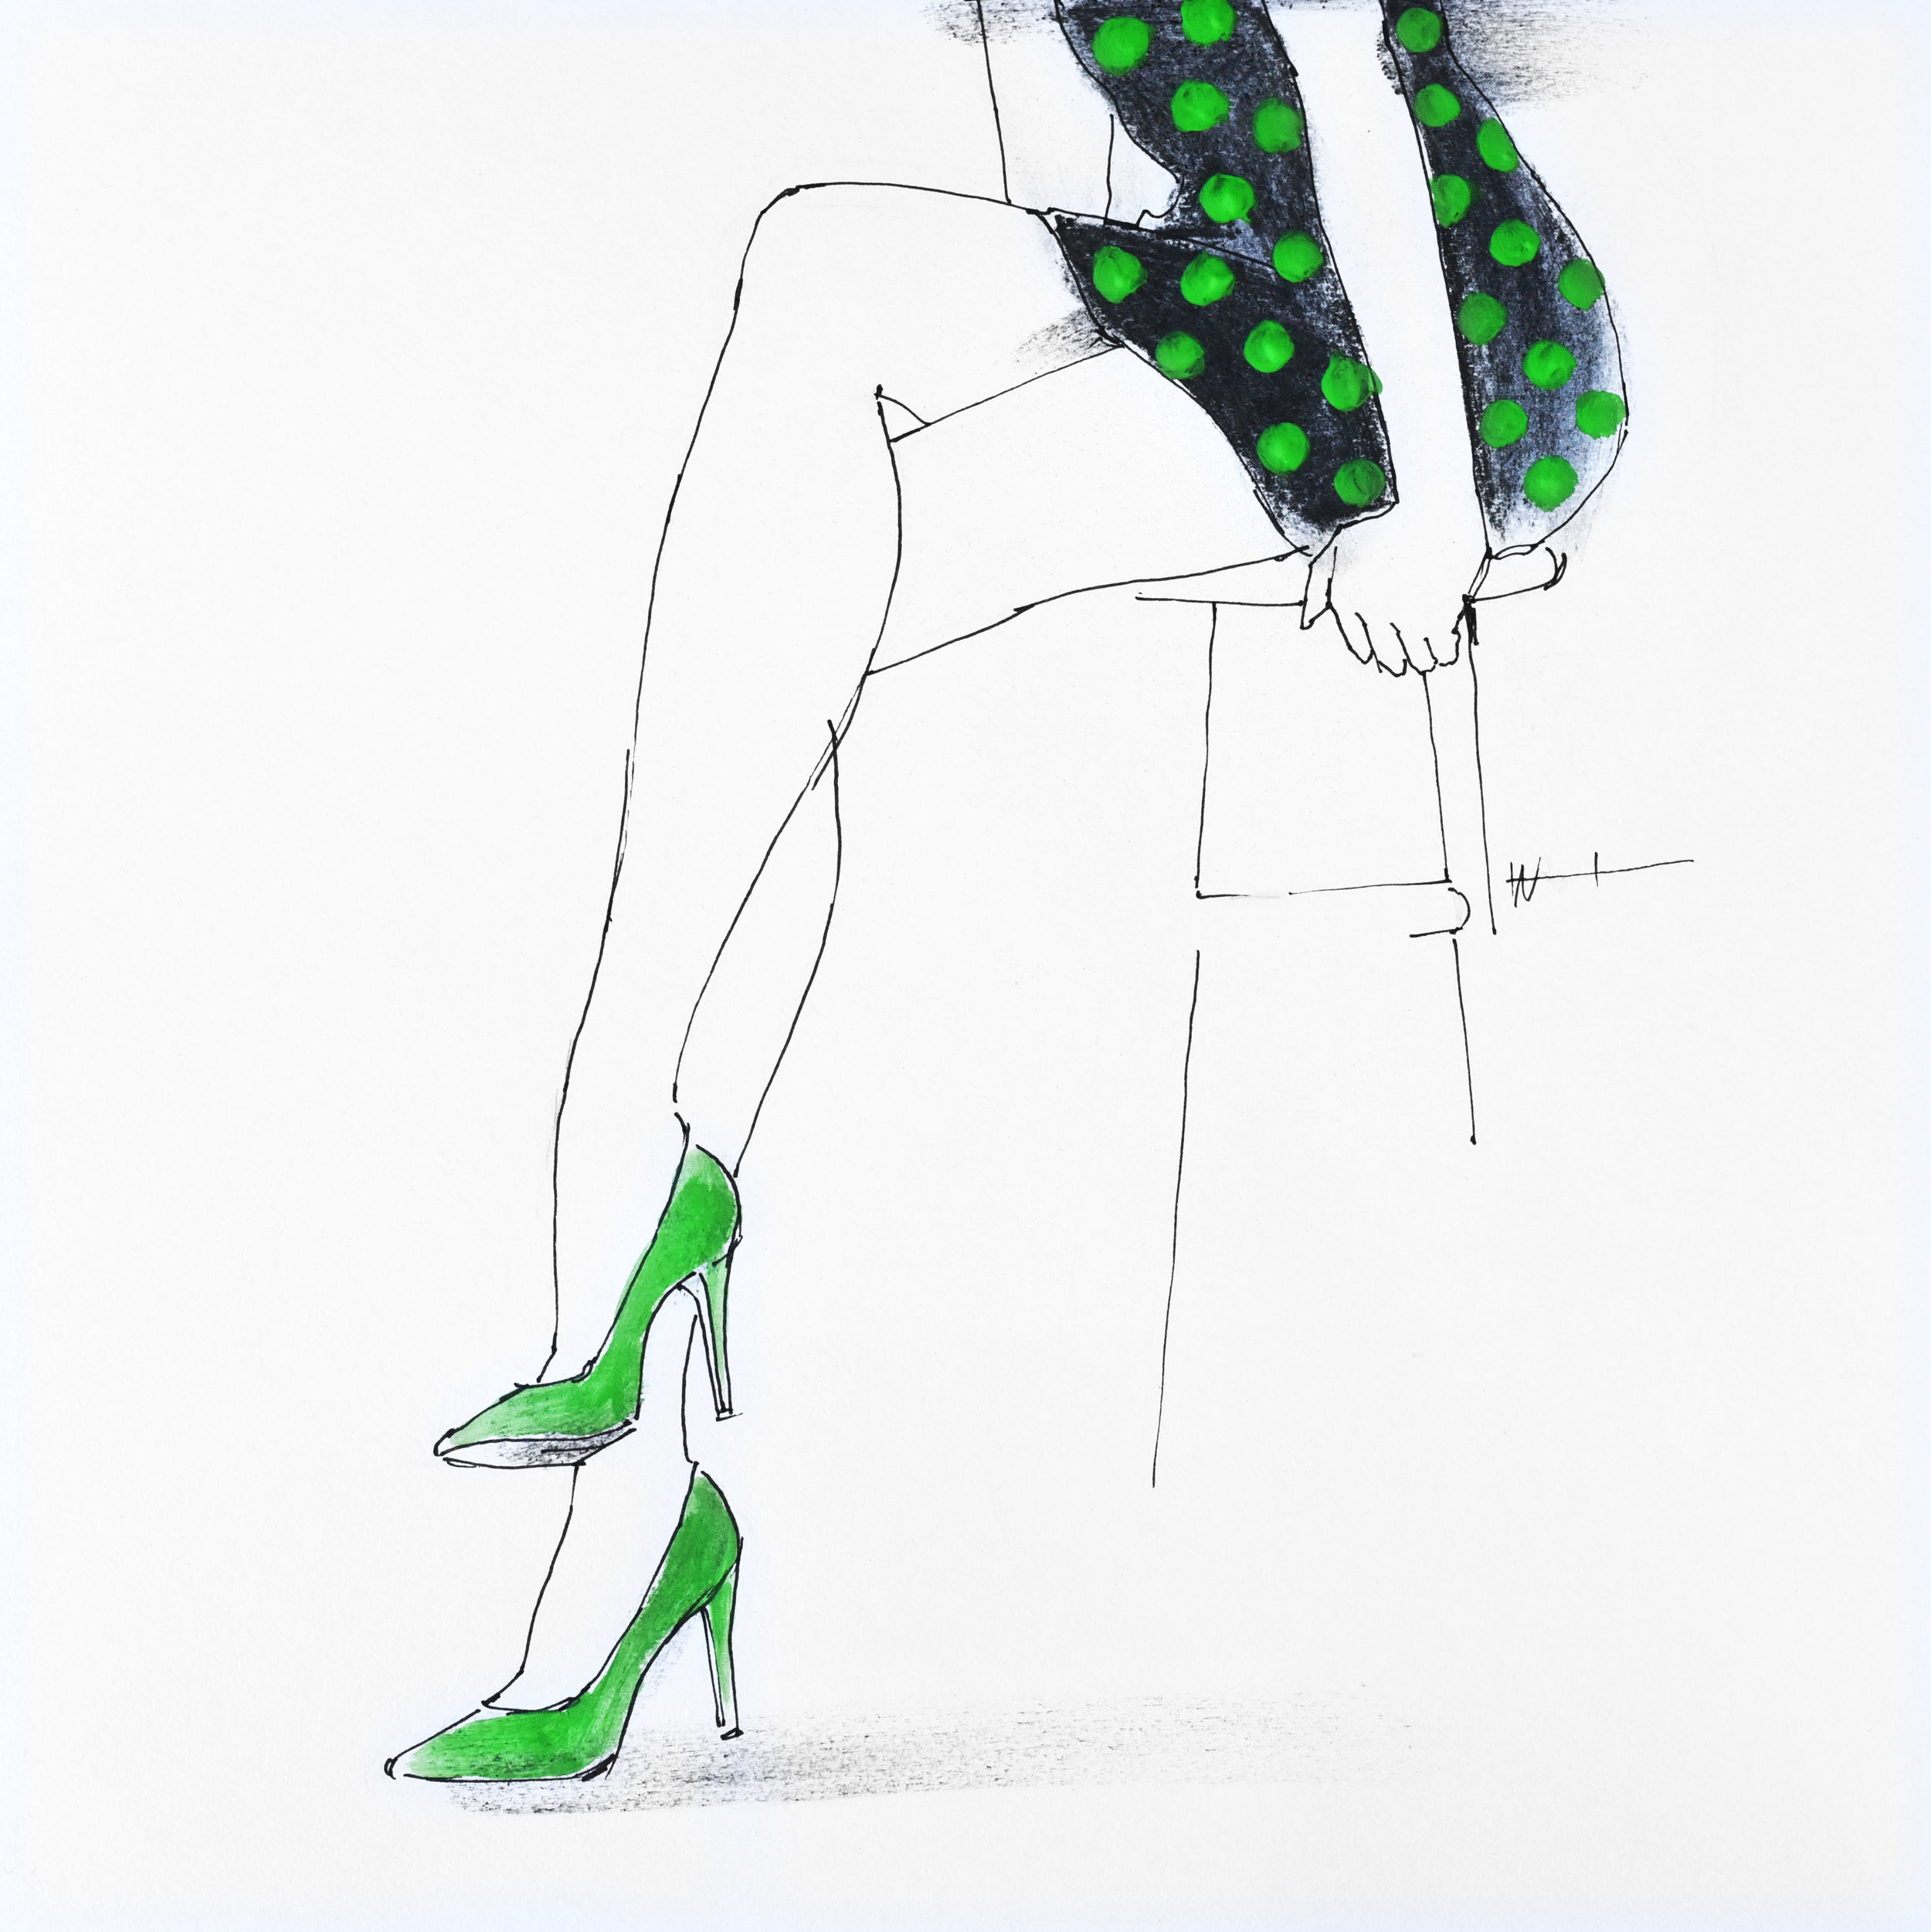 Minimal fashion illustration line drawing of a woman in a polka dot dress.